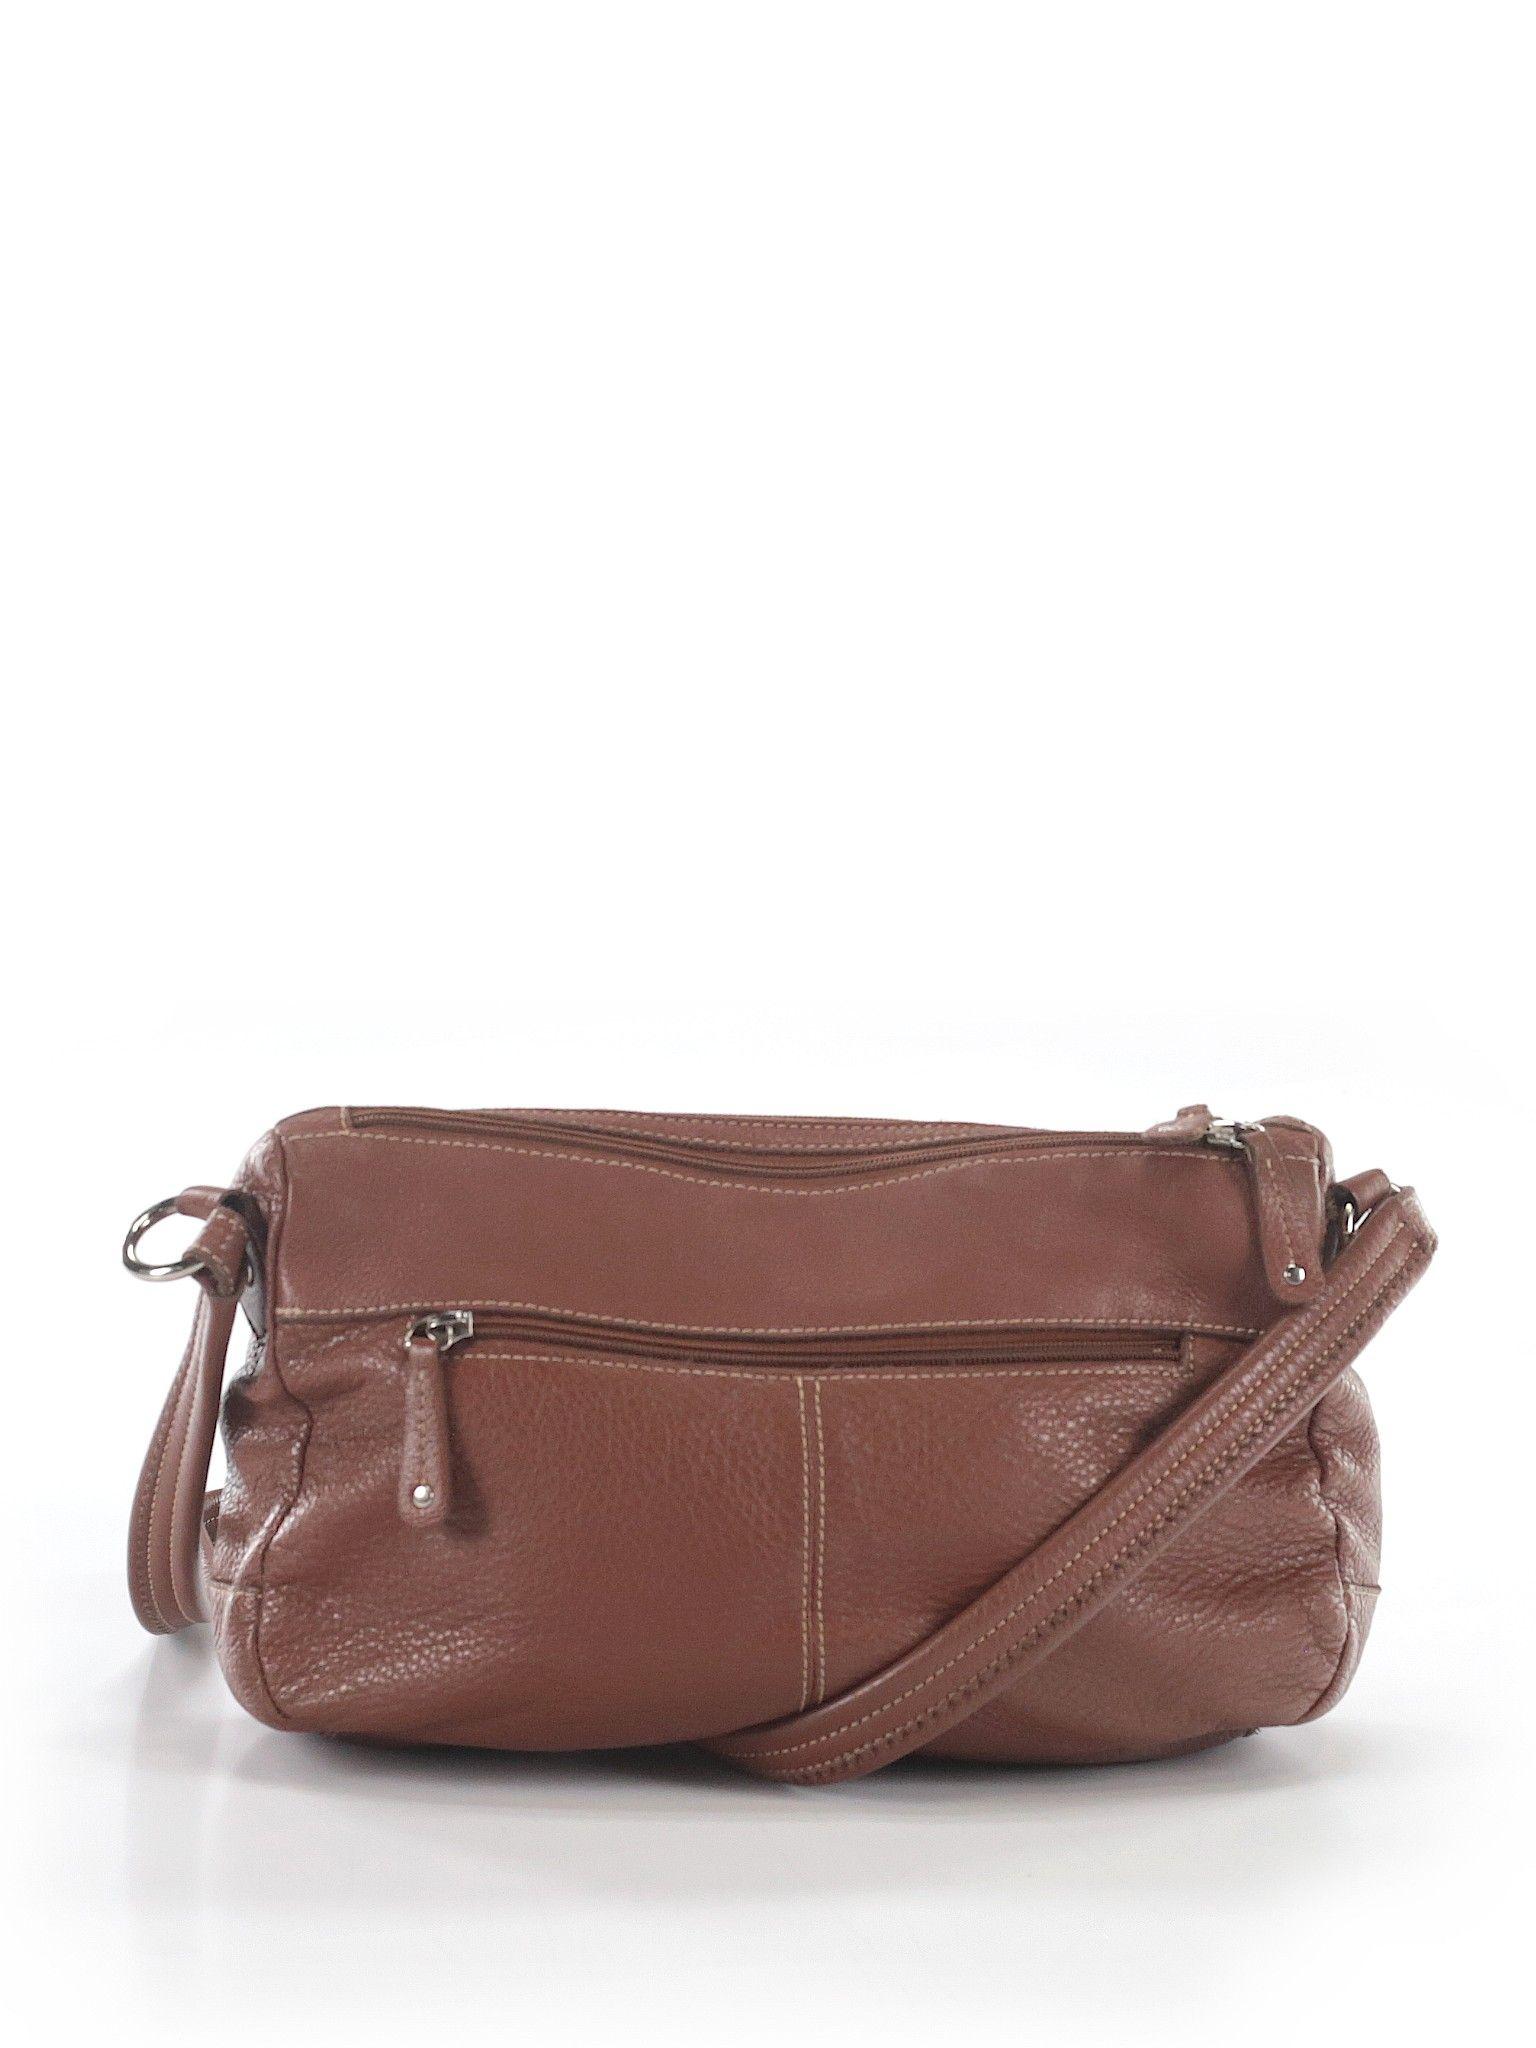 4ce003ebb Crossbody Bag | Products | Crossbody bag, Brown crossbody bag, Bags